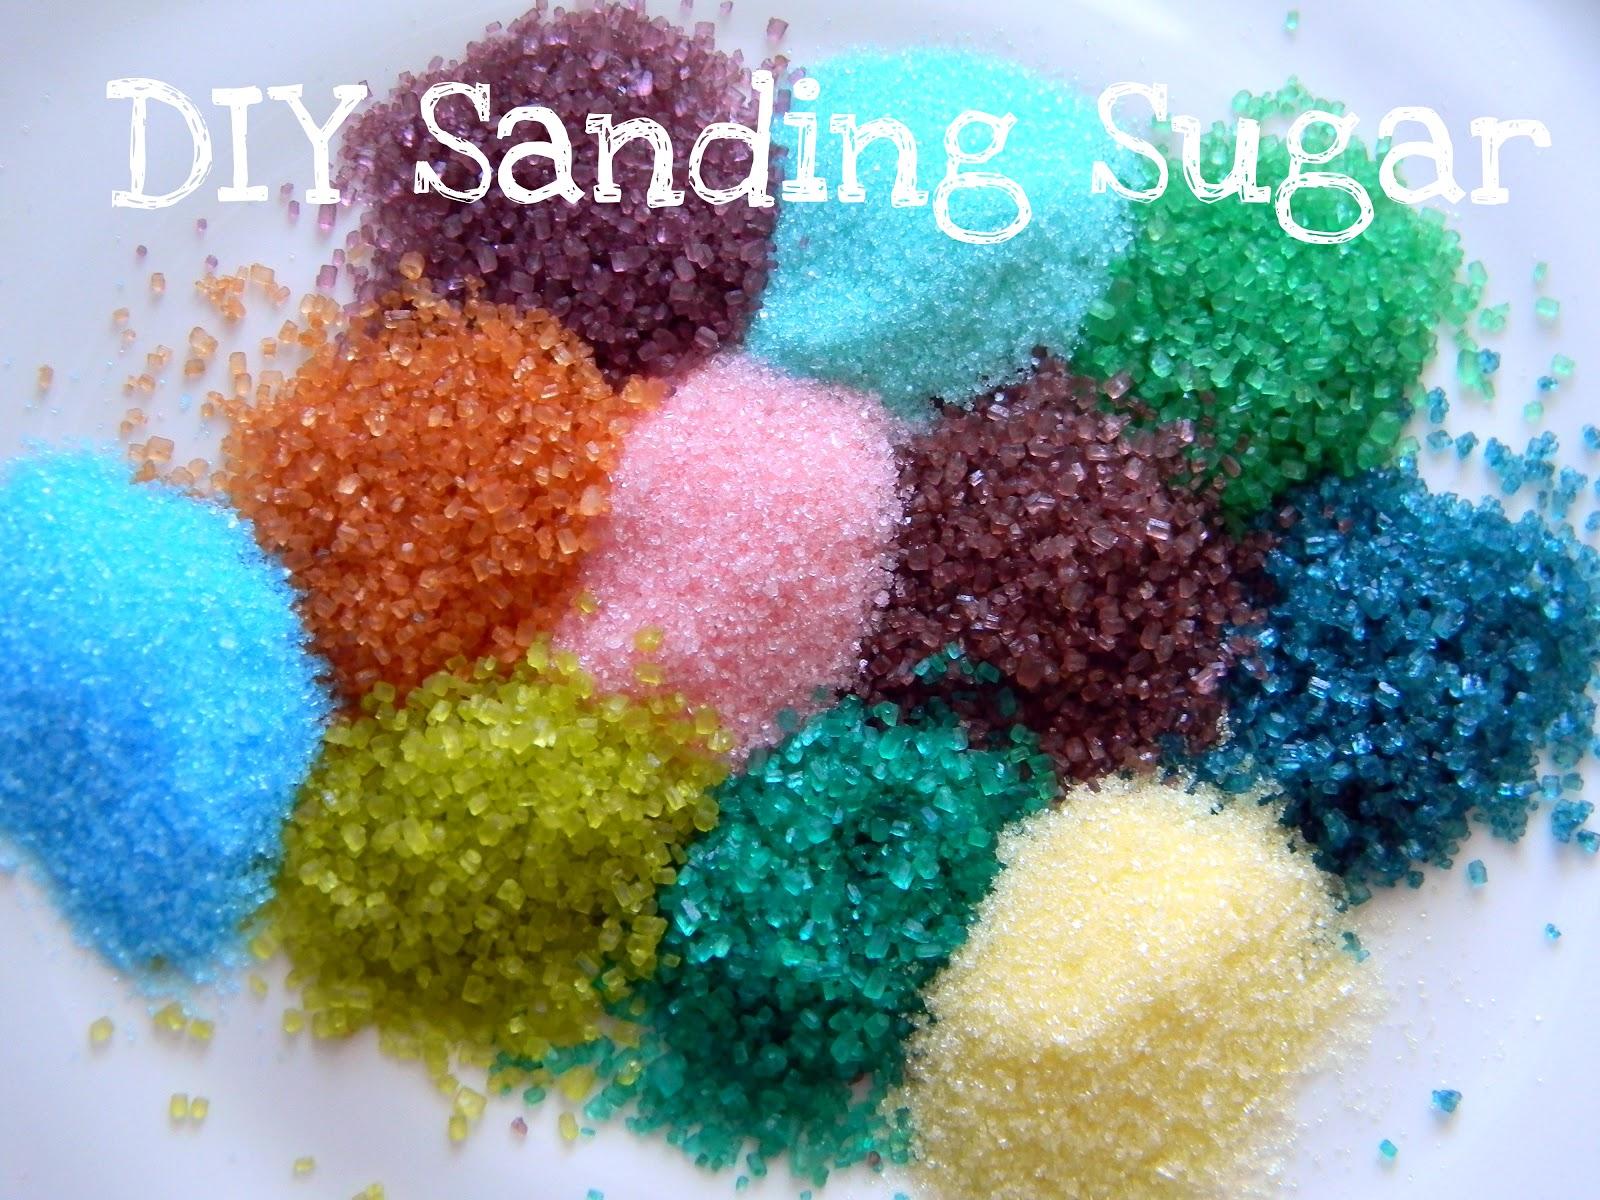 Sour Sanding Sugar Recipe